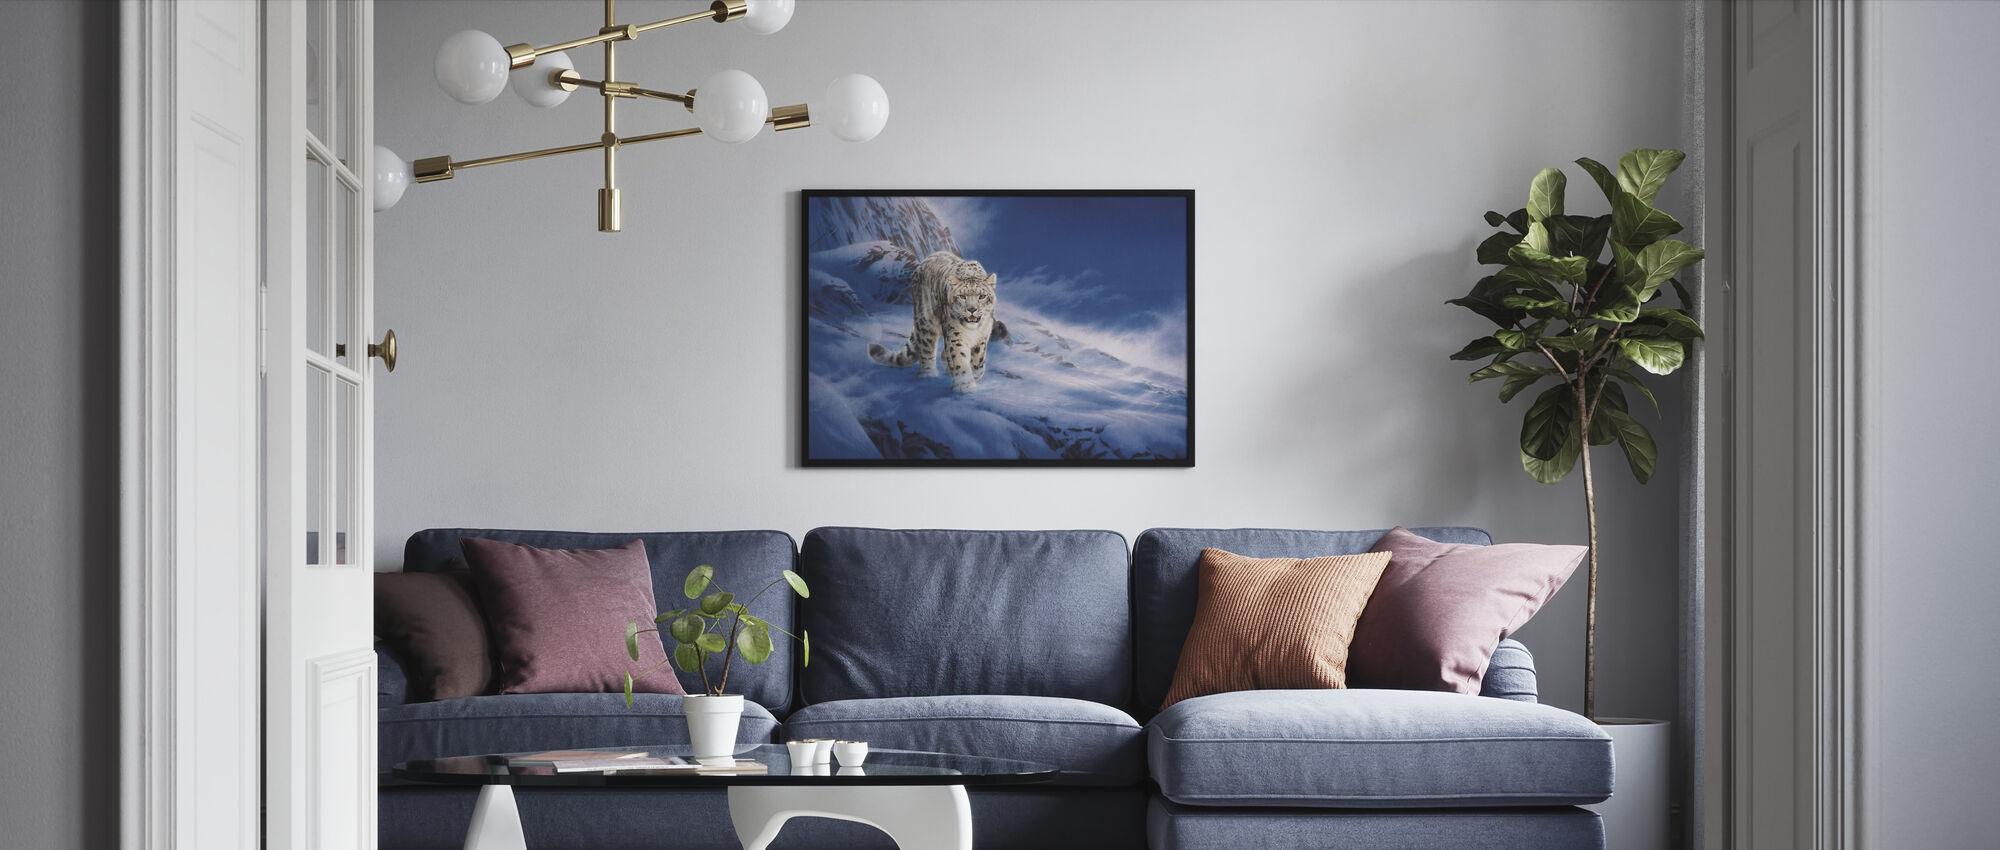 Snow Leopard - Framed print - Living Room